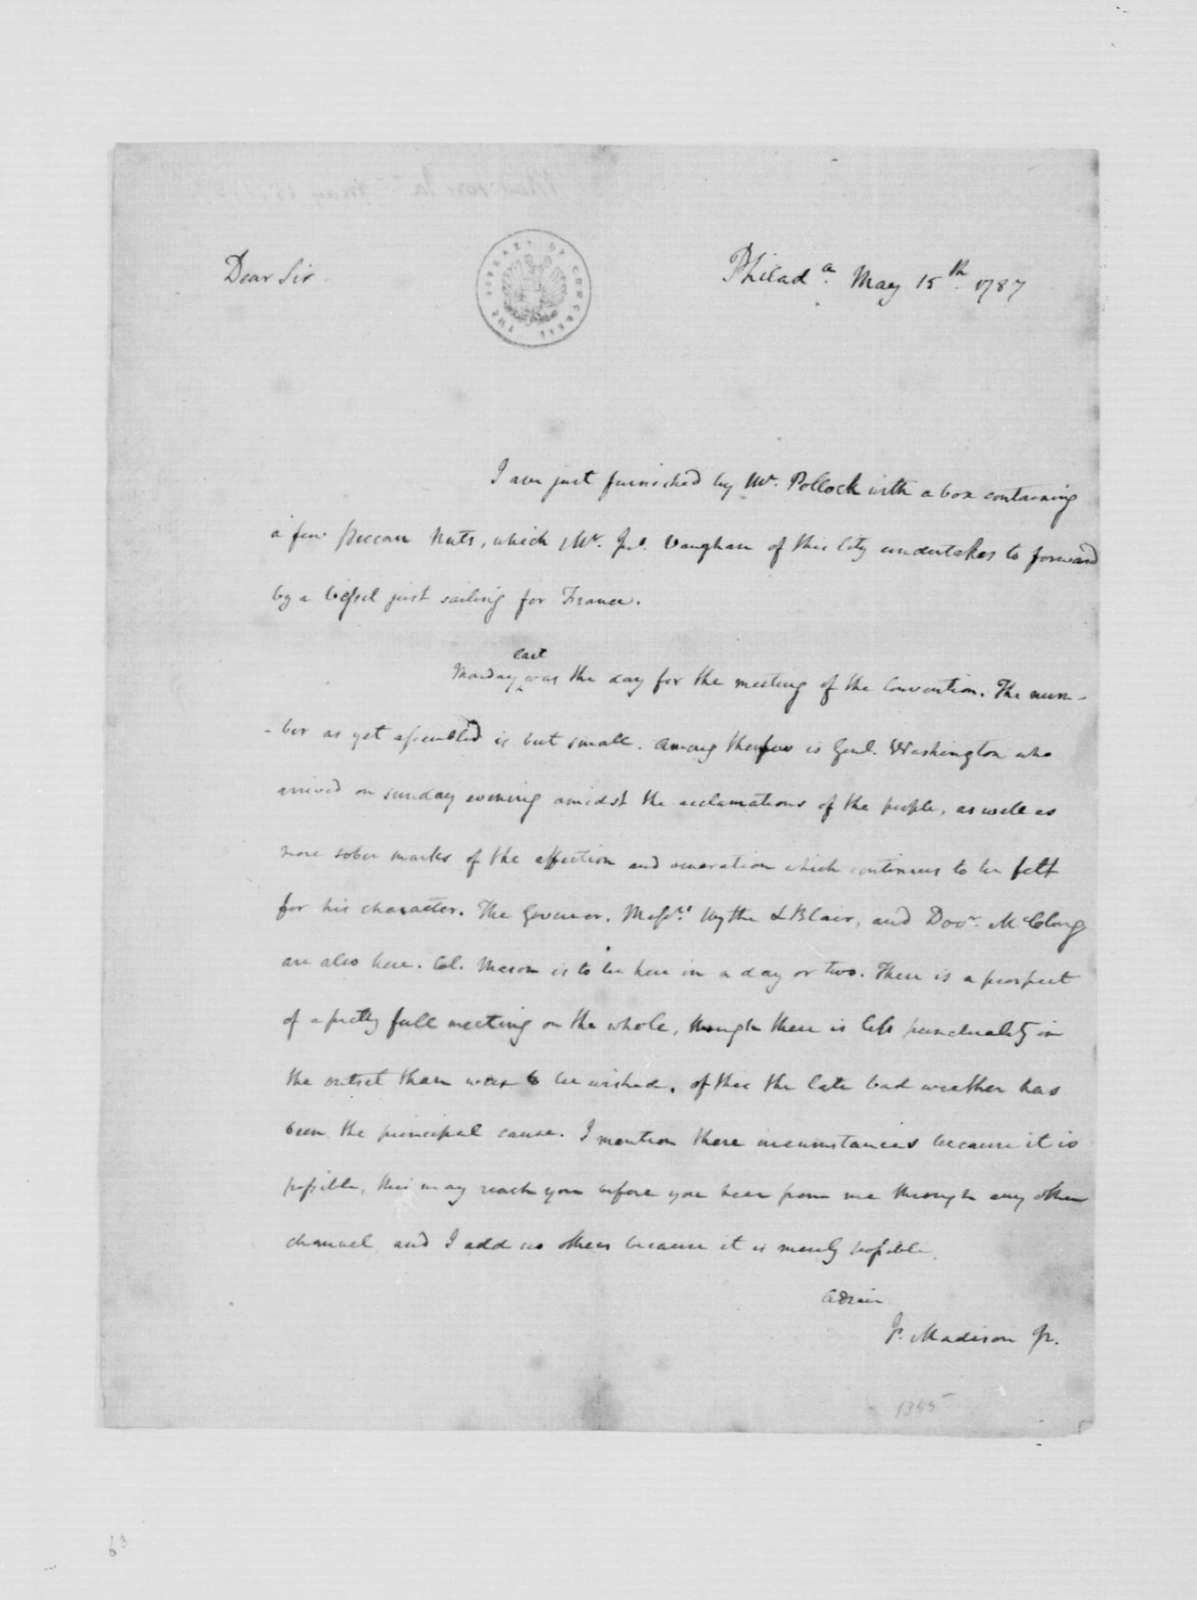 James Madison to Thomas Jefferson, May 12, 1787.